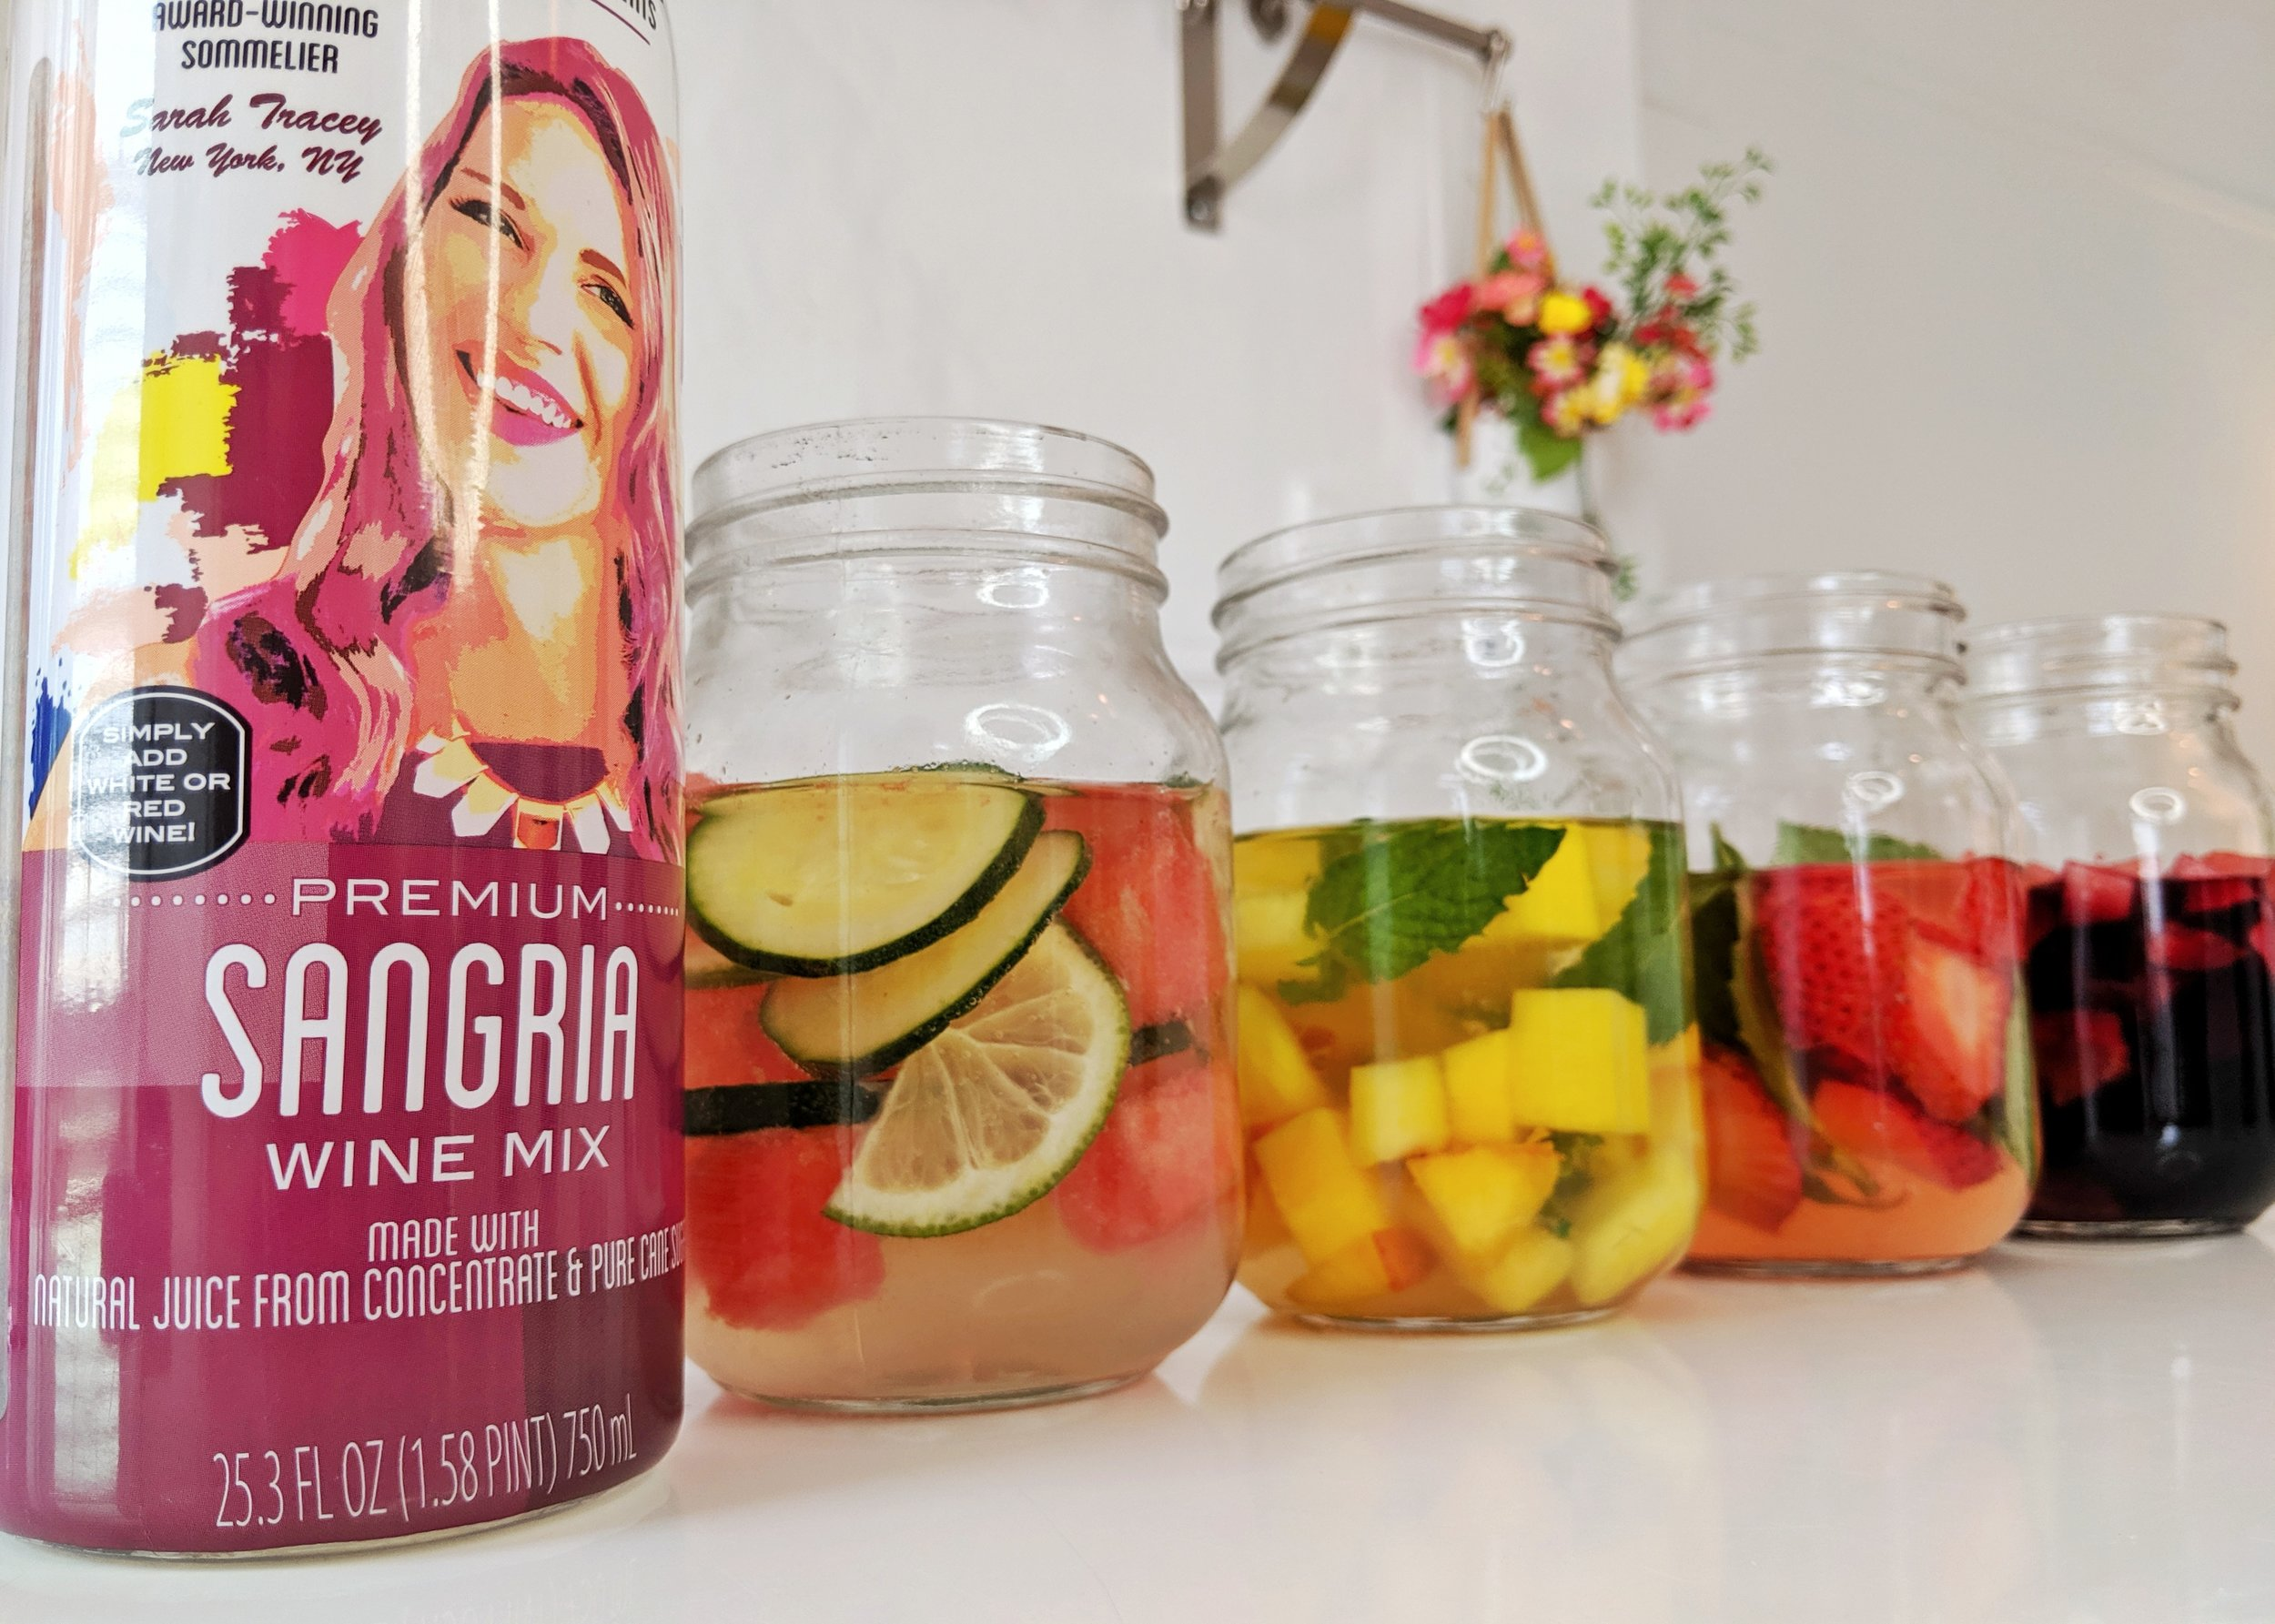 Sangria 4 ways in seconds with Cocktail Artist Premium Sangria Wine Mix